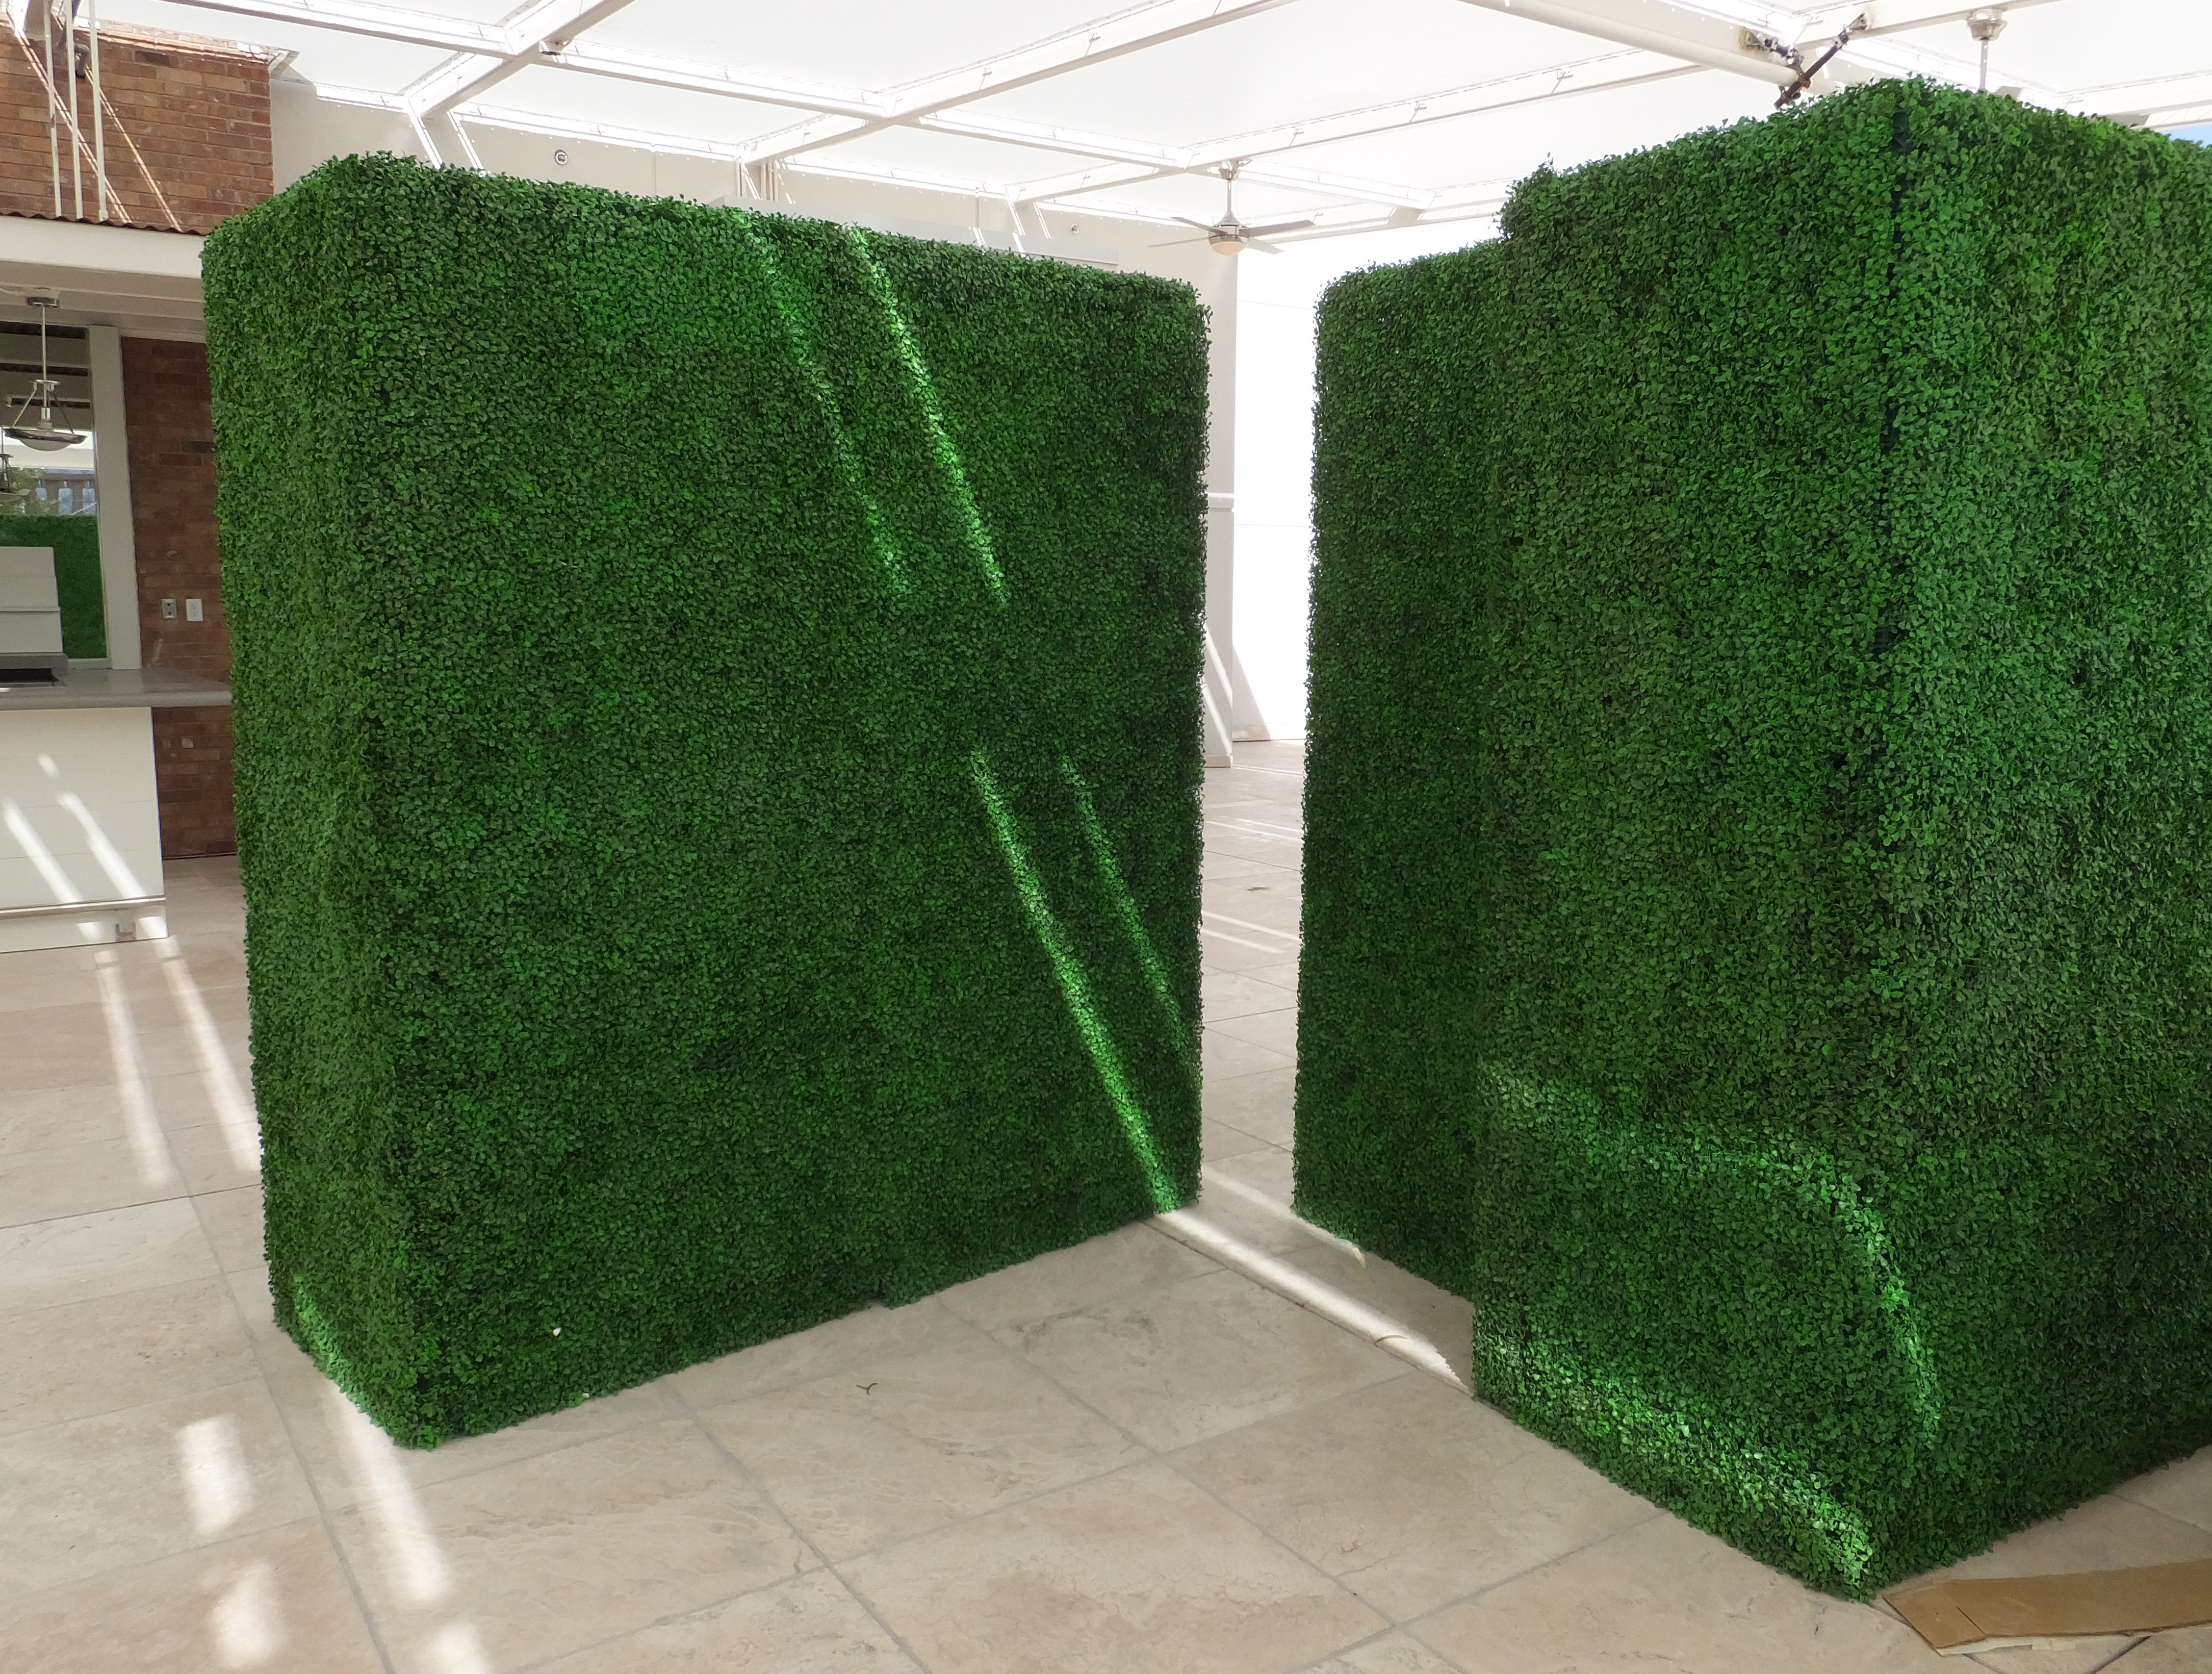 Make Be Leaves 7ft Tall Uv Boxwood Hedges Make Be Leaves